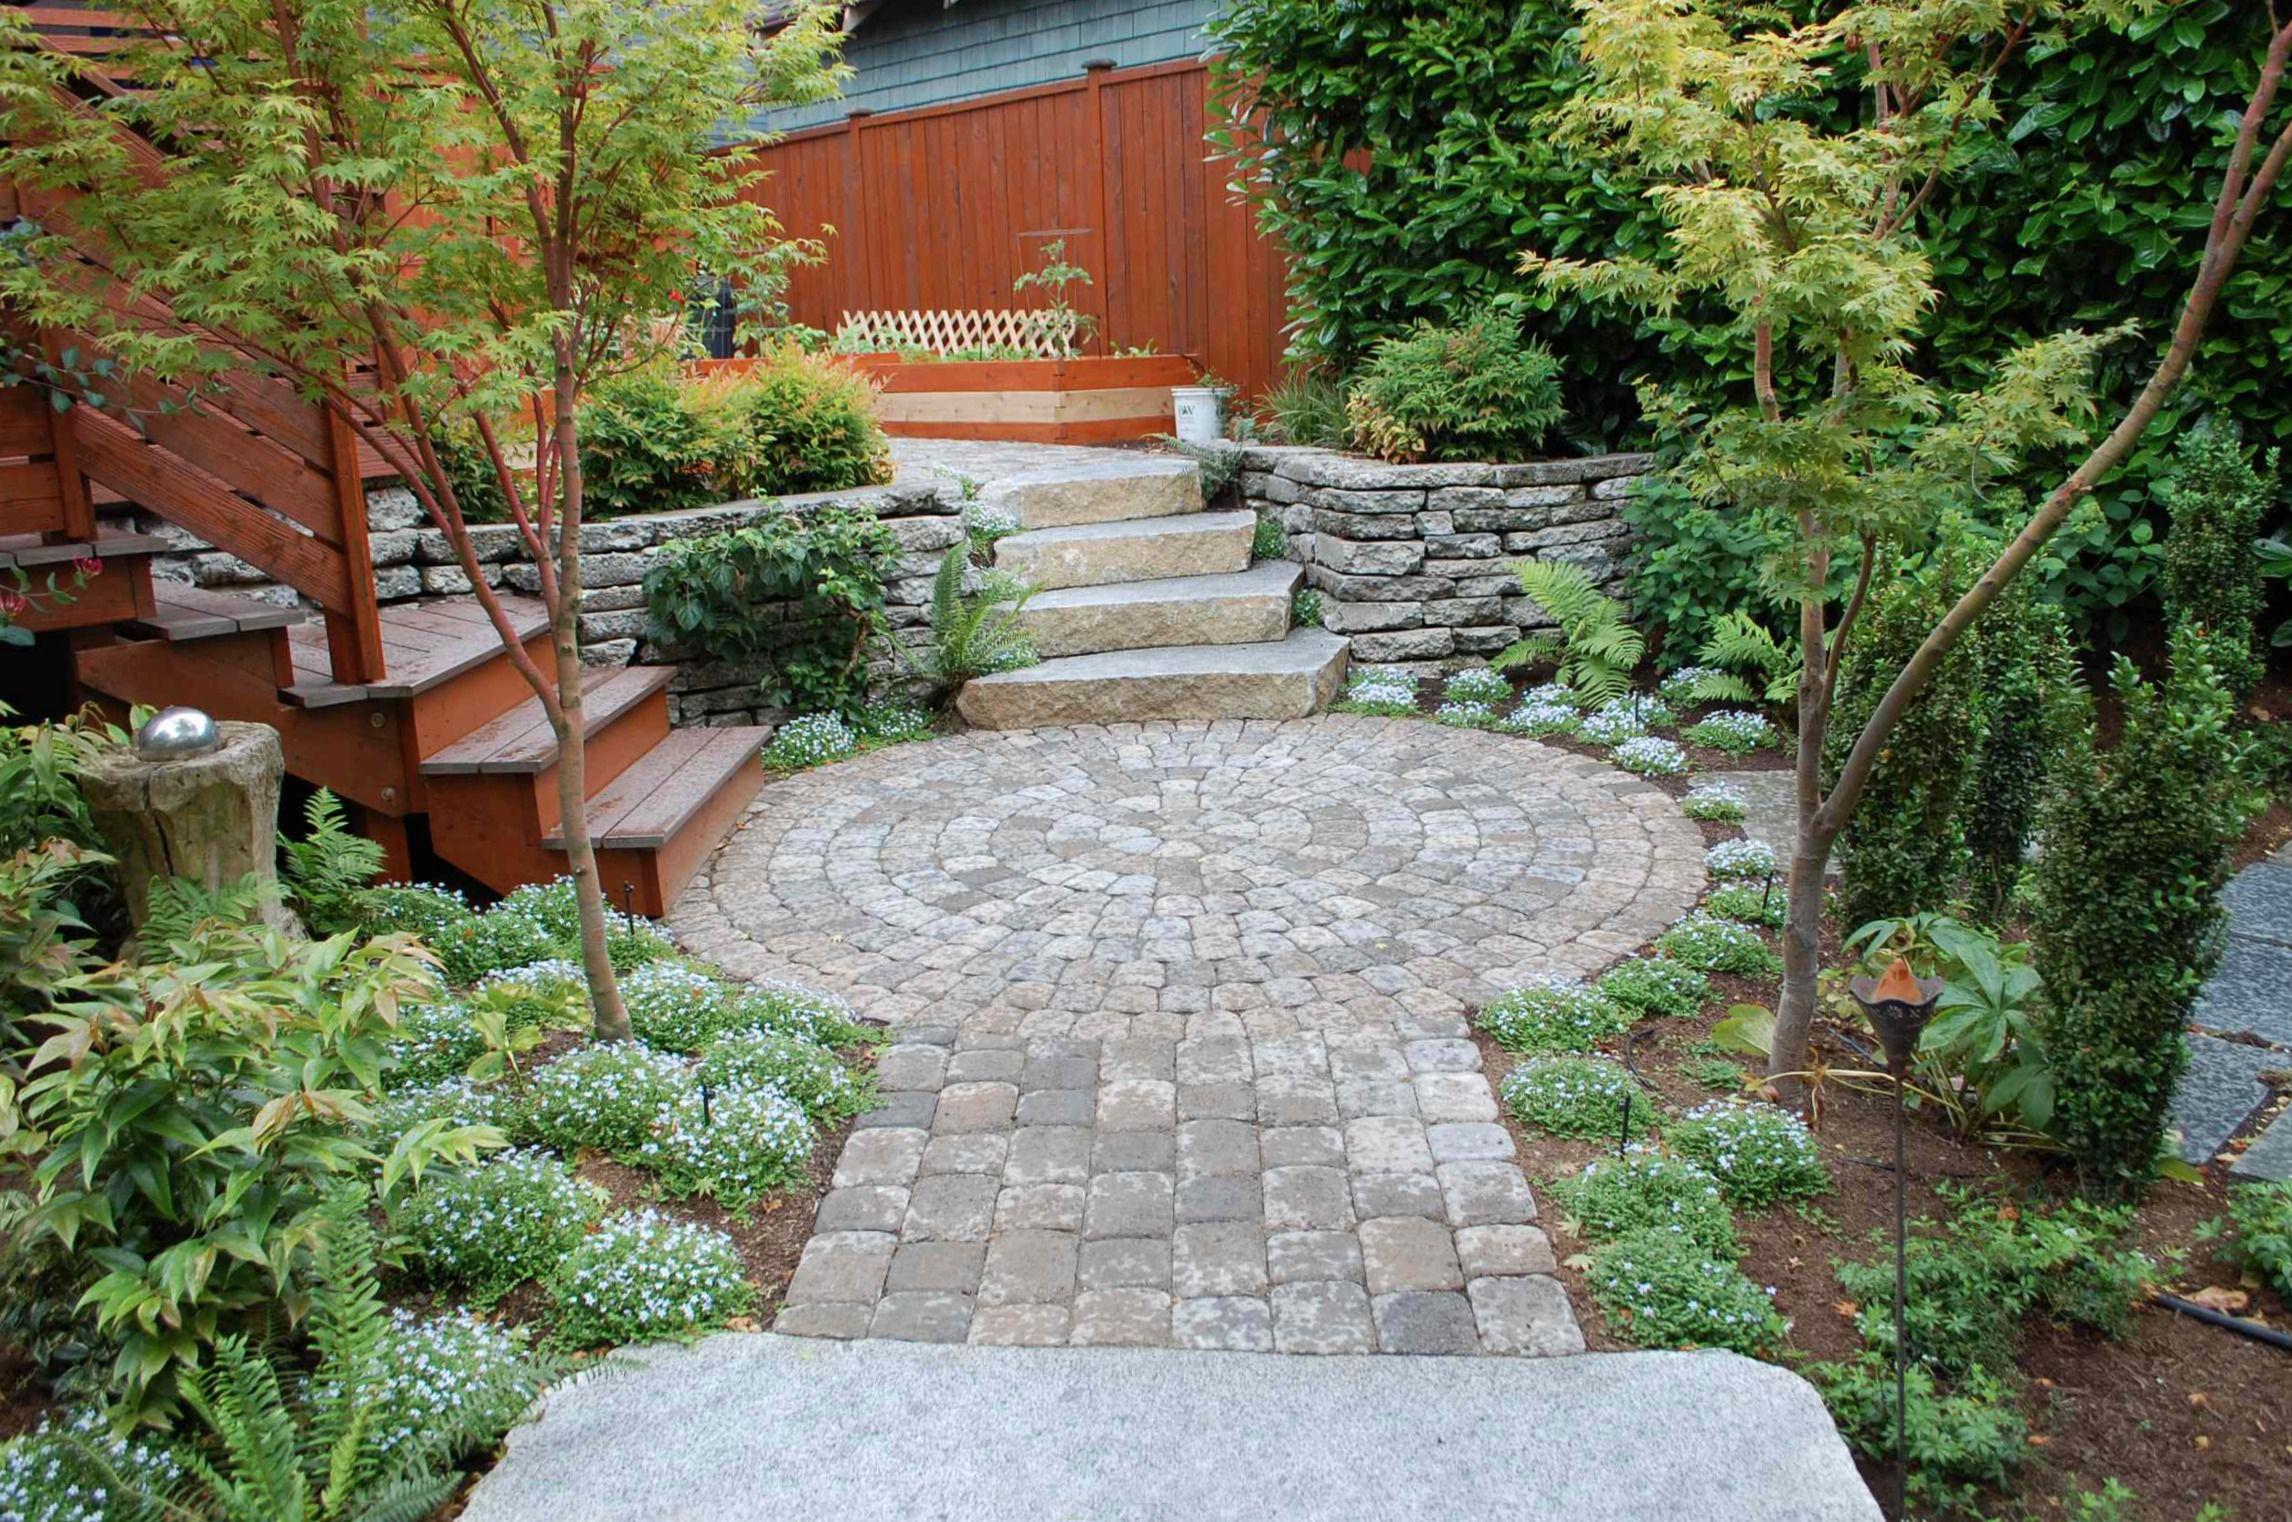 25 Perfect Patio Paver Design Ideas on Small Backyard Paver Patio Ideas id=32287